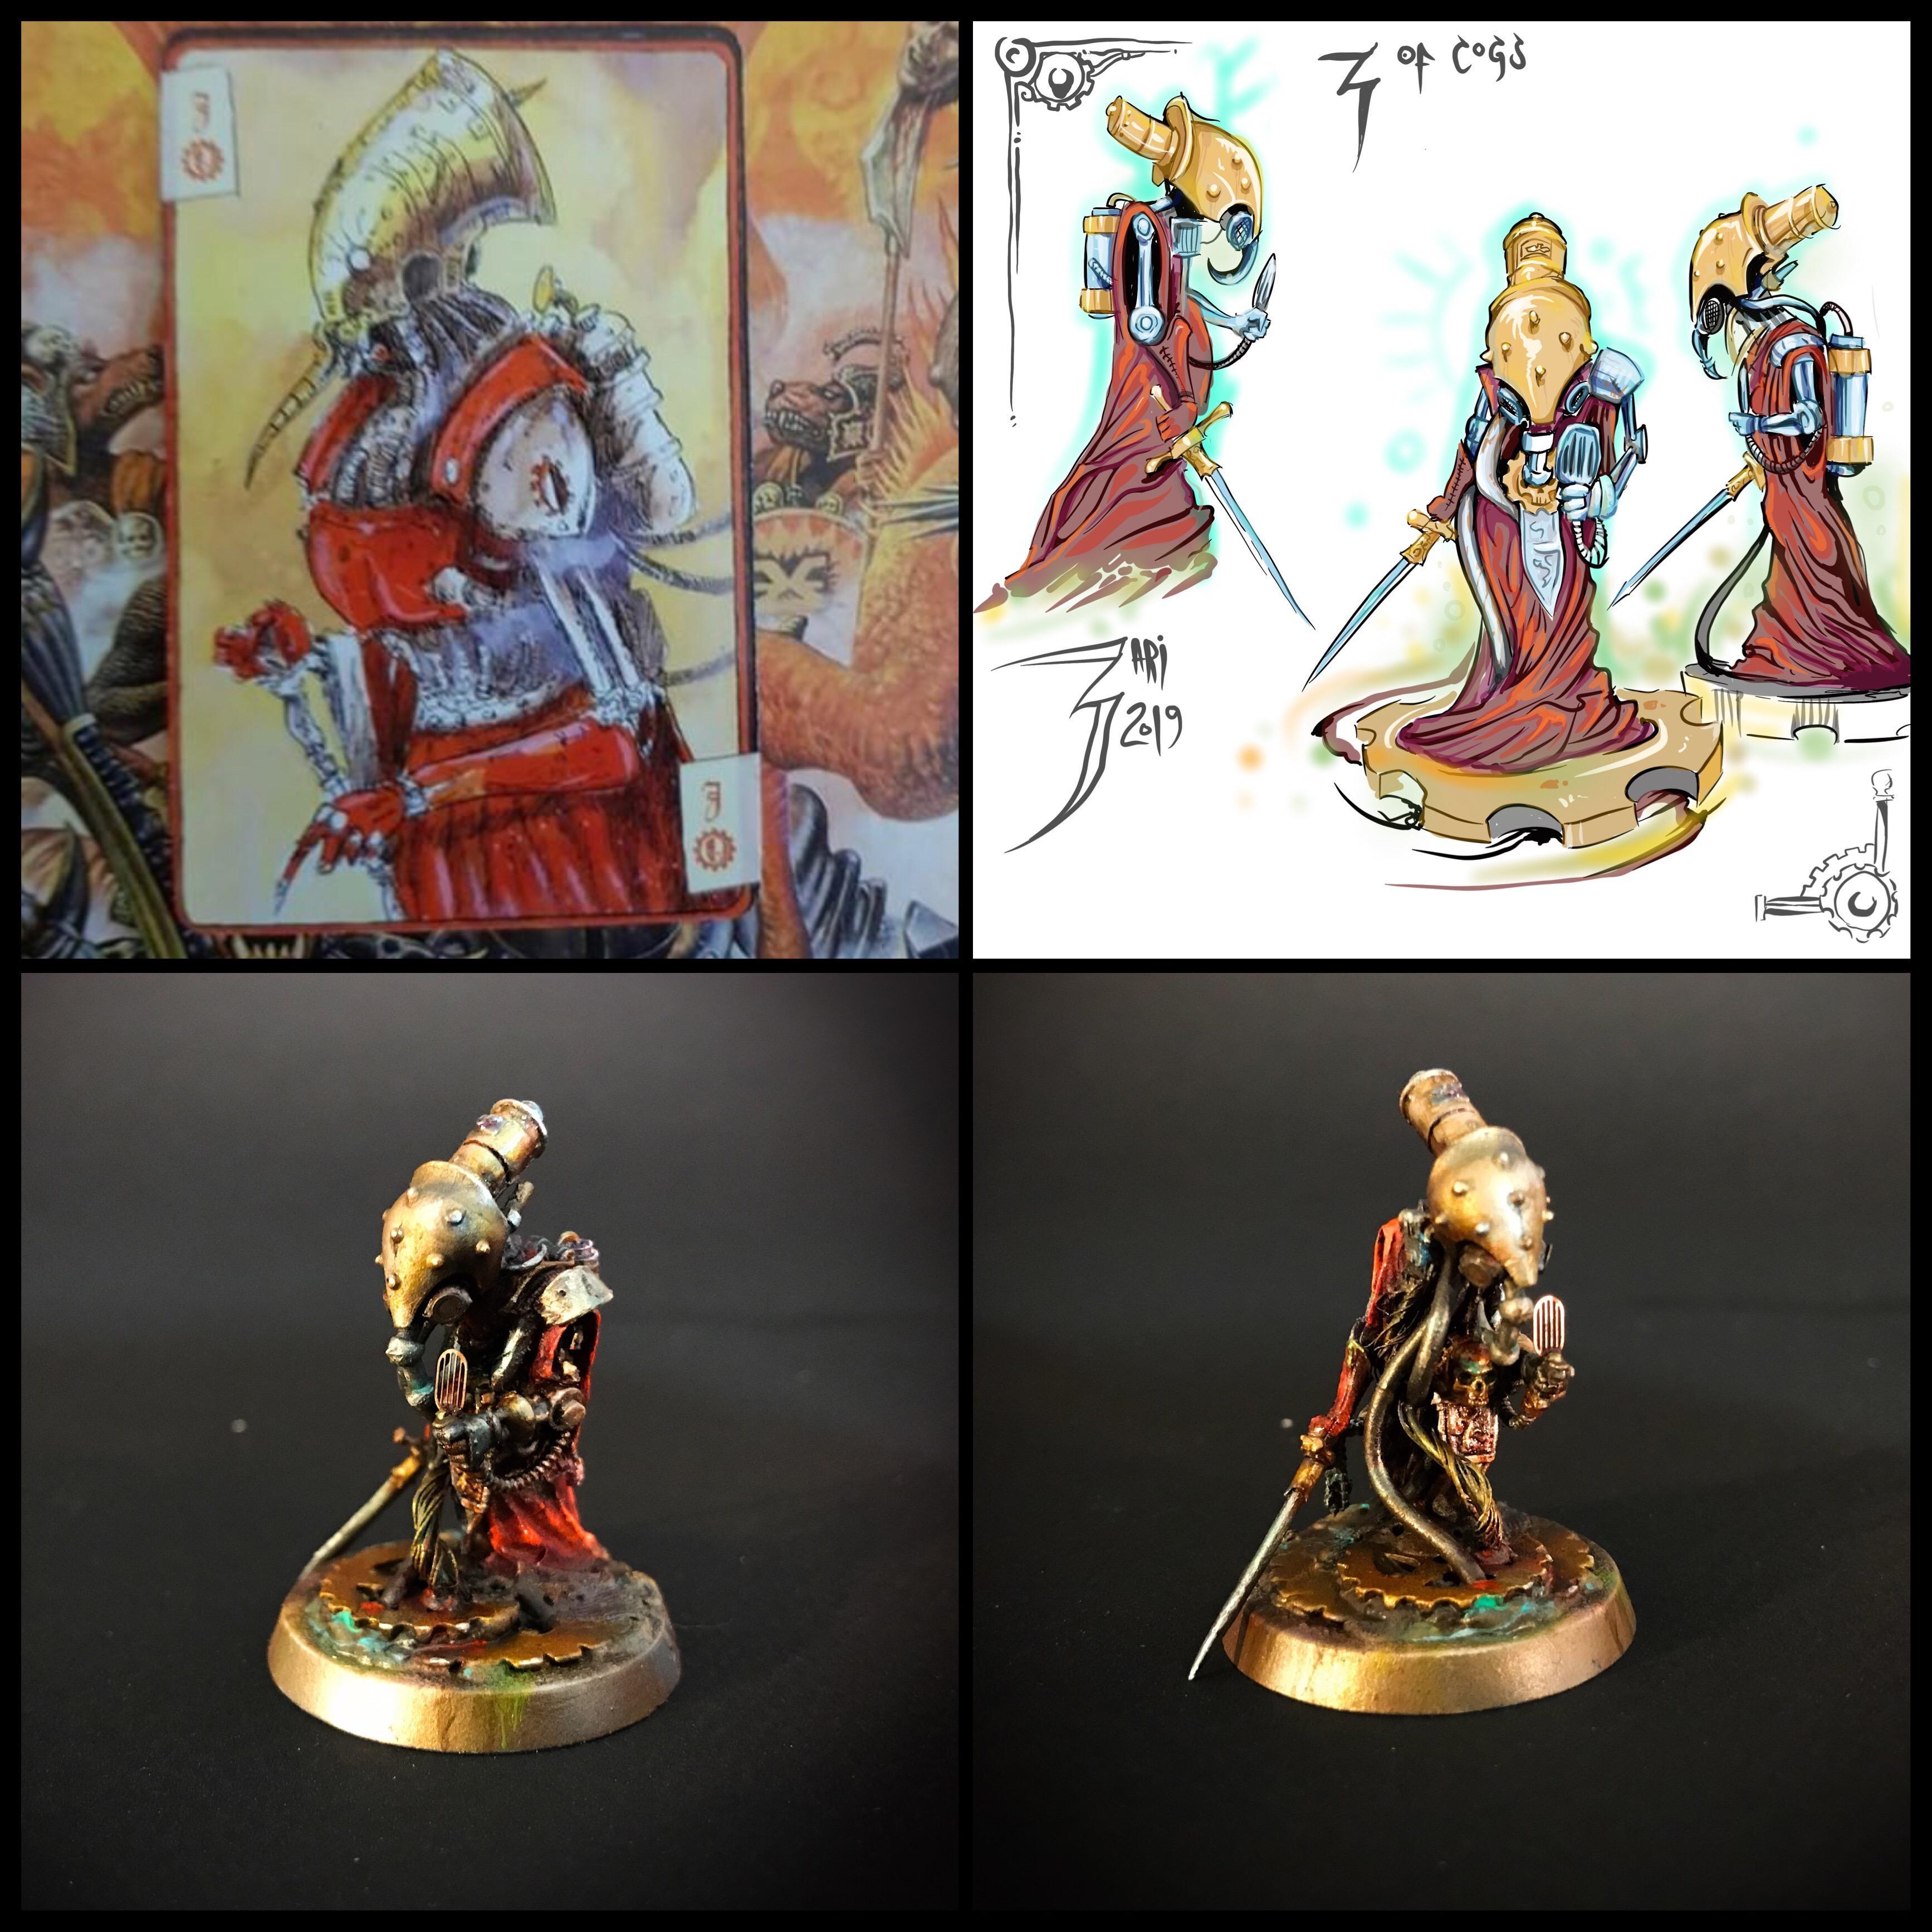 Admech, Airbrushed, Cogs, Grim Dark Cards, Grimdark, Horus Heresy, Kitbash, Limited Edition, Microphone, Non-Metallic Metal, Sword, Warhammer 40,000